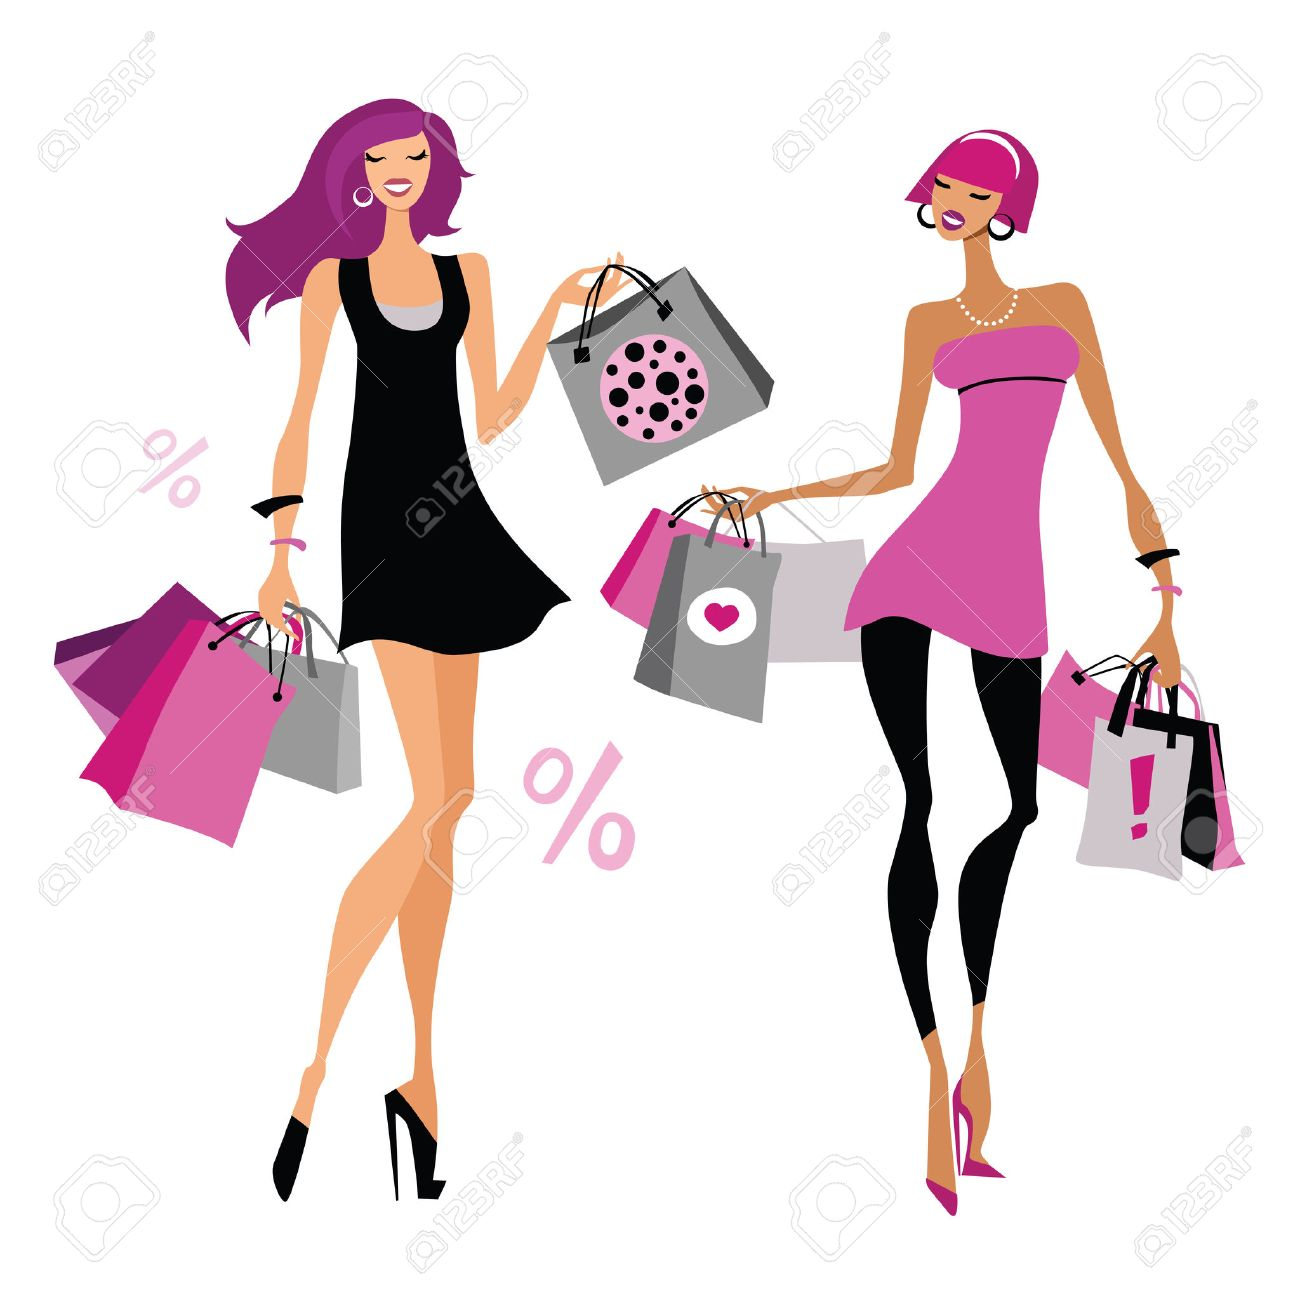 imagen silueta mujer con bolsas